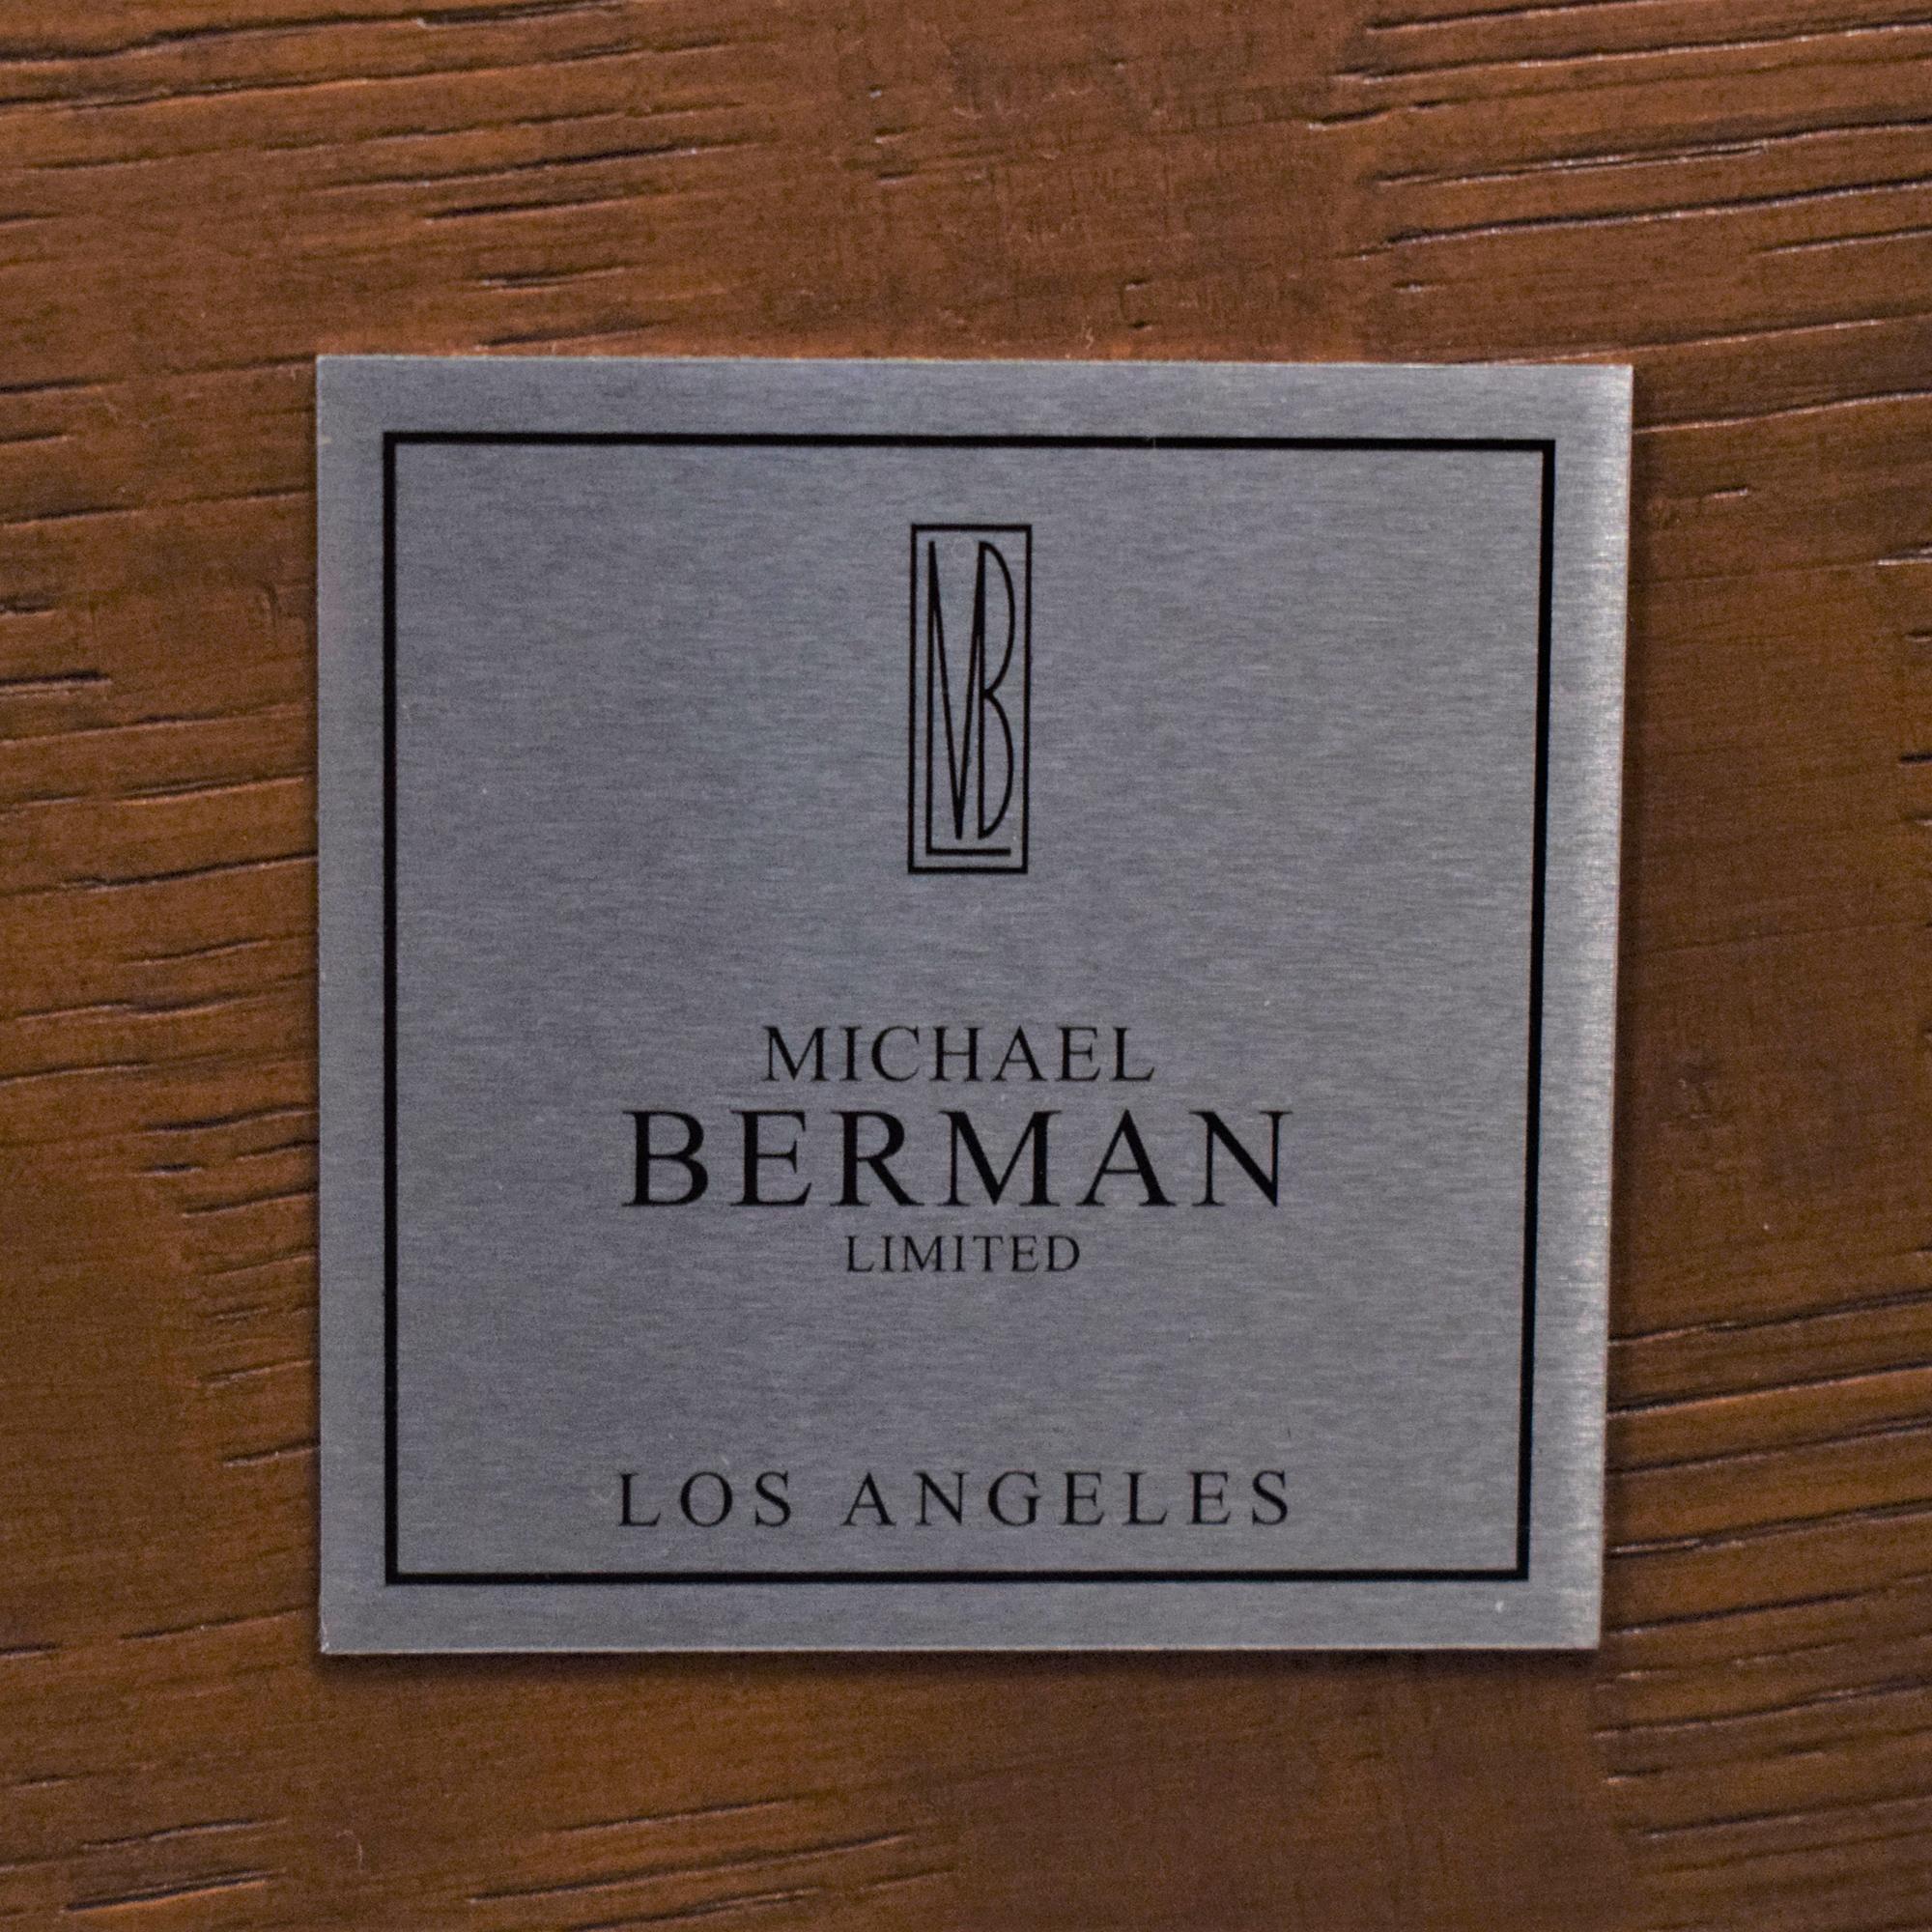 buy Michael Berman Limited Michael Berman Limited Trousdale Coffee Table online